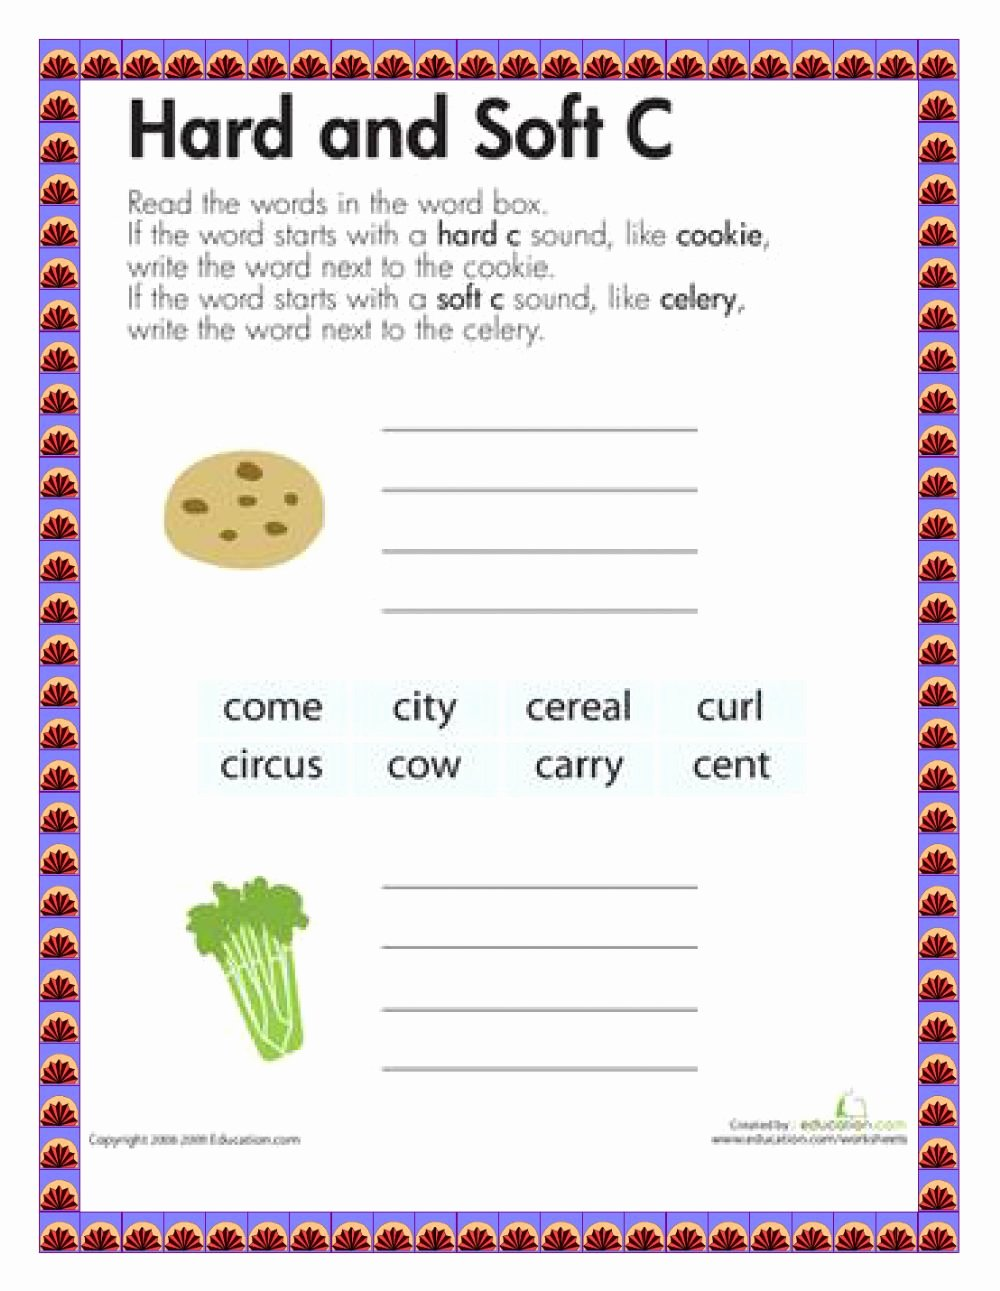 Hard and soft C Worksheets Printable Hard and soft C Interactive Worksheet